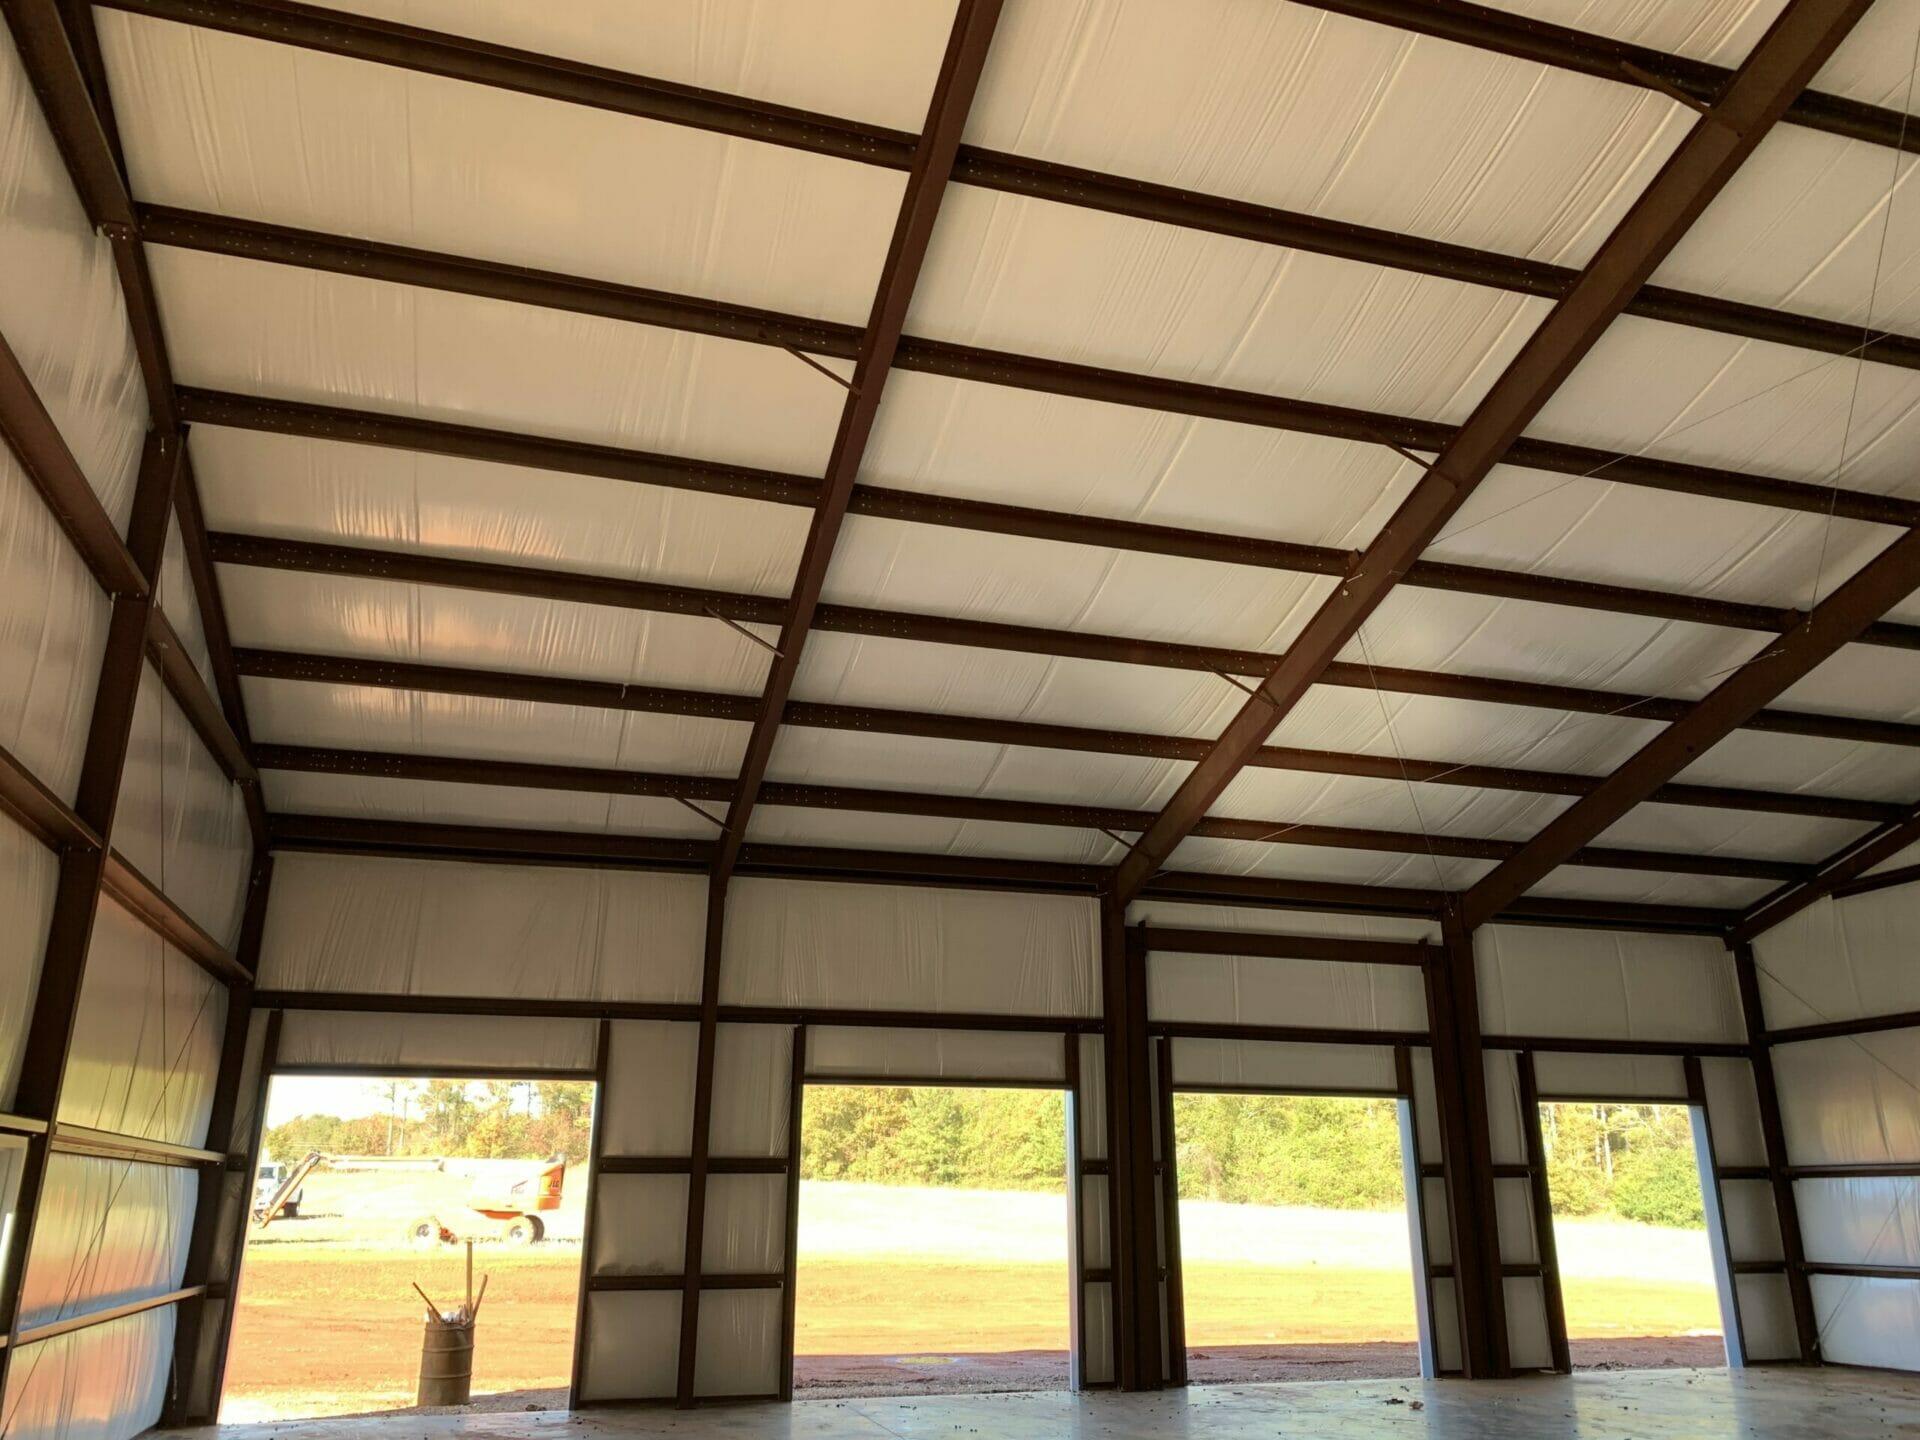 Interior View Of Pre-Engineered Metal Garage Building With Roll Up Garage Doors